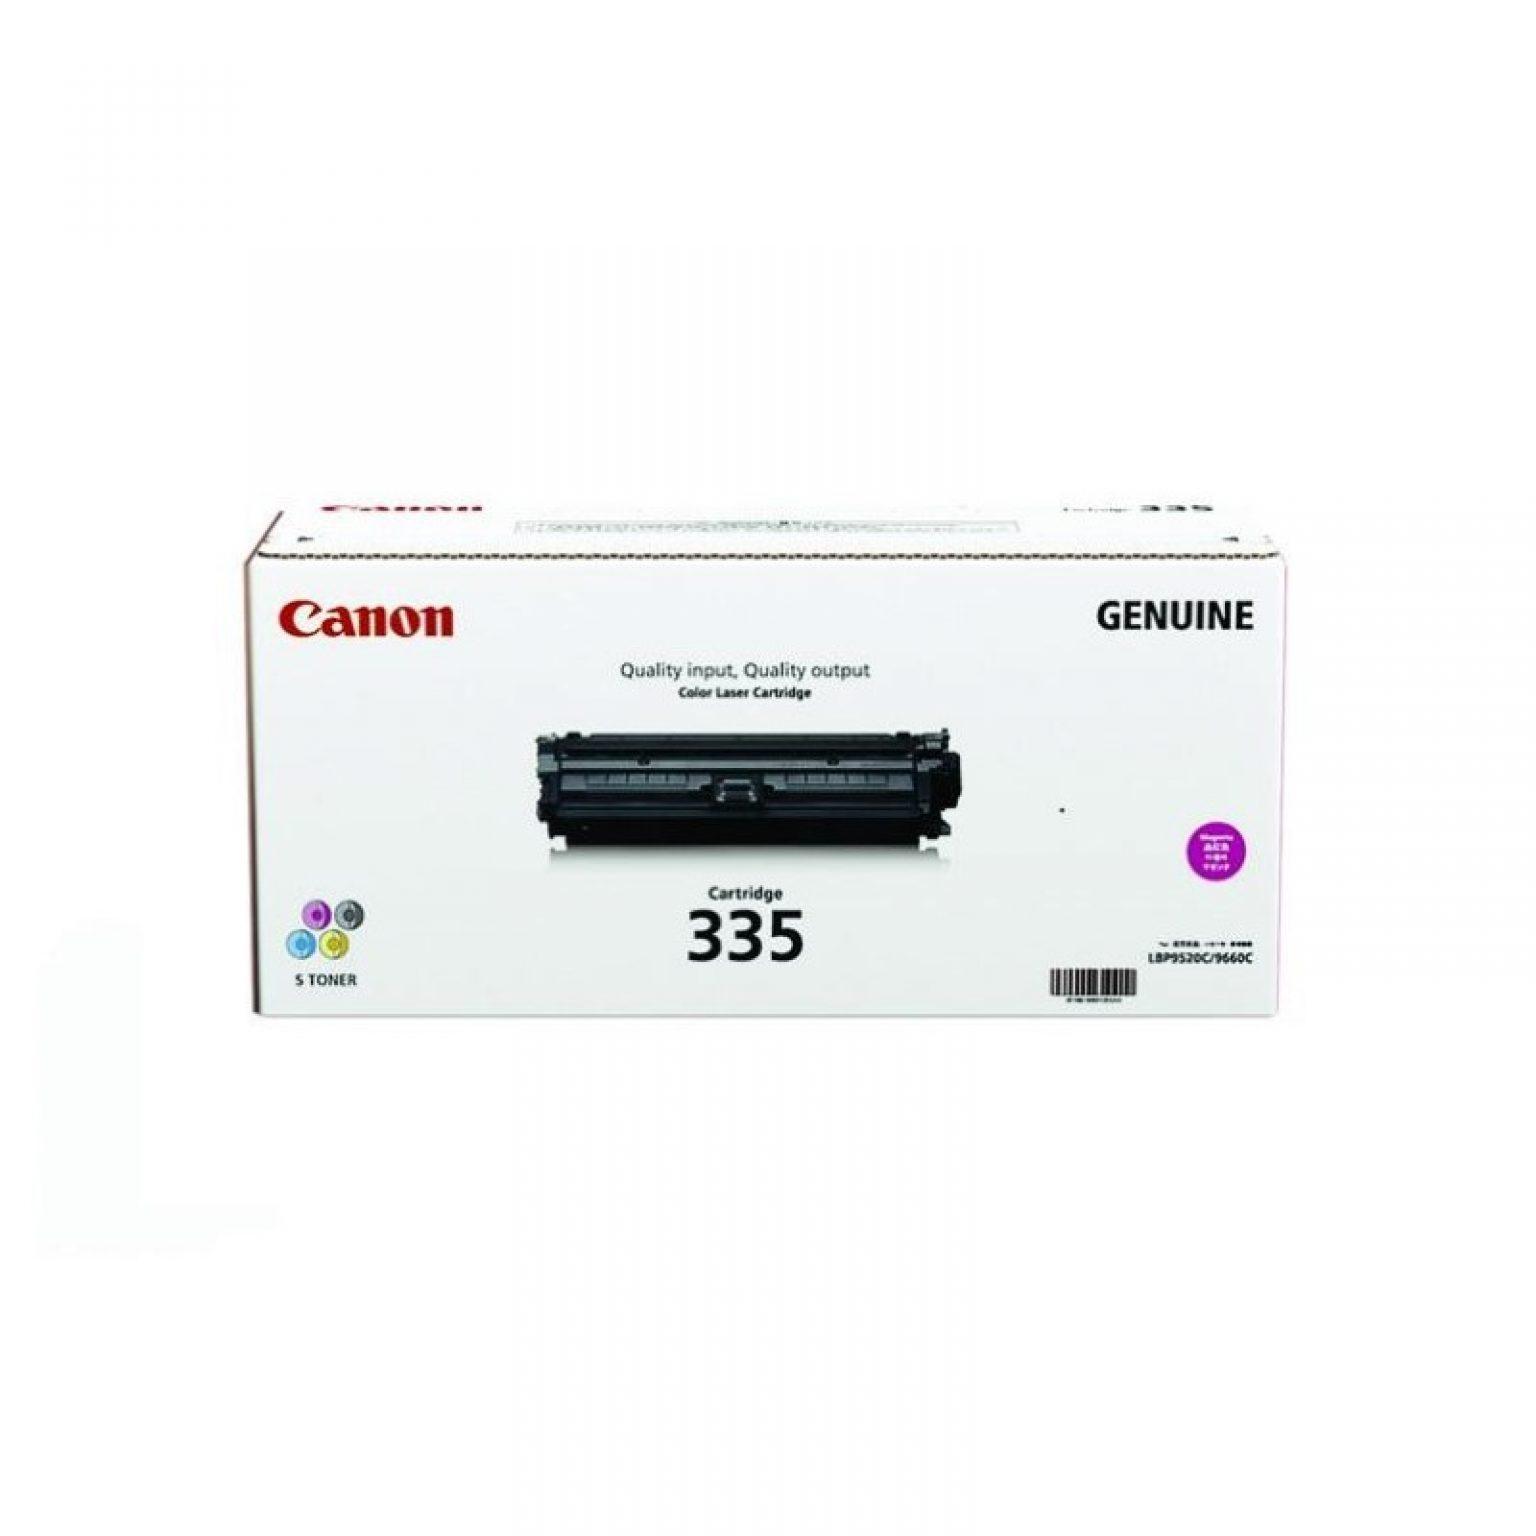 CANON - Toner cartridge 335 magenta High Yield for LBP841CDN/843CX [EP335M]